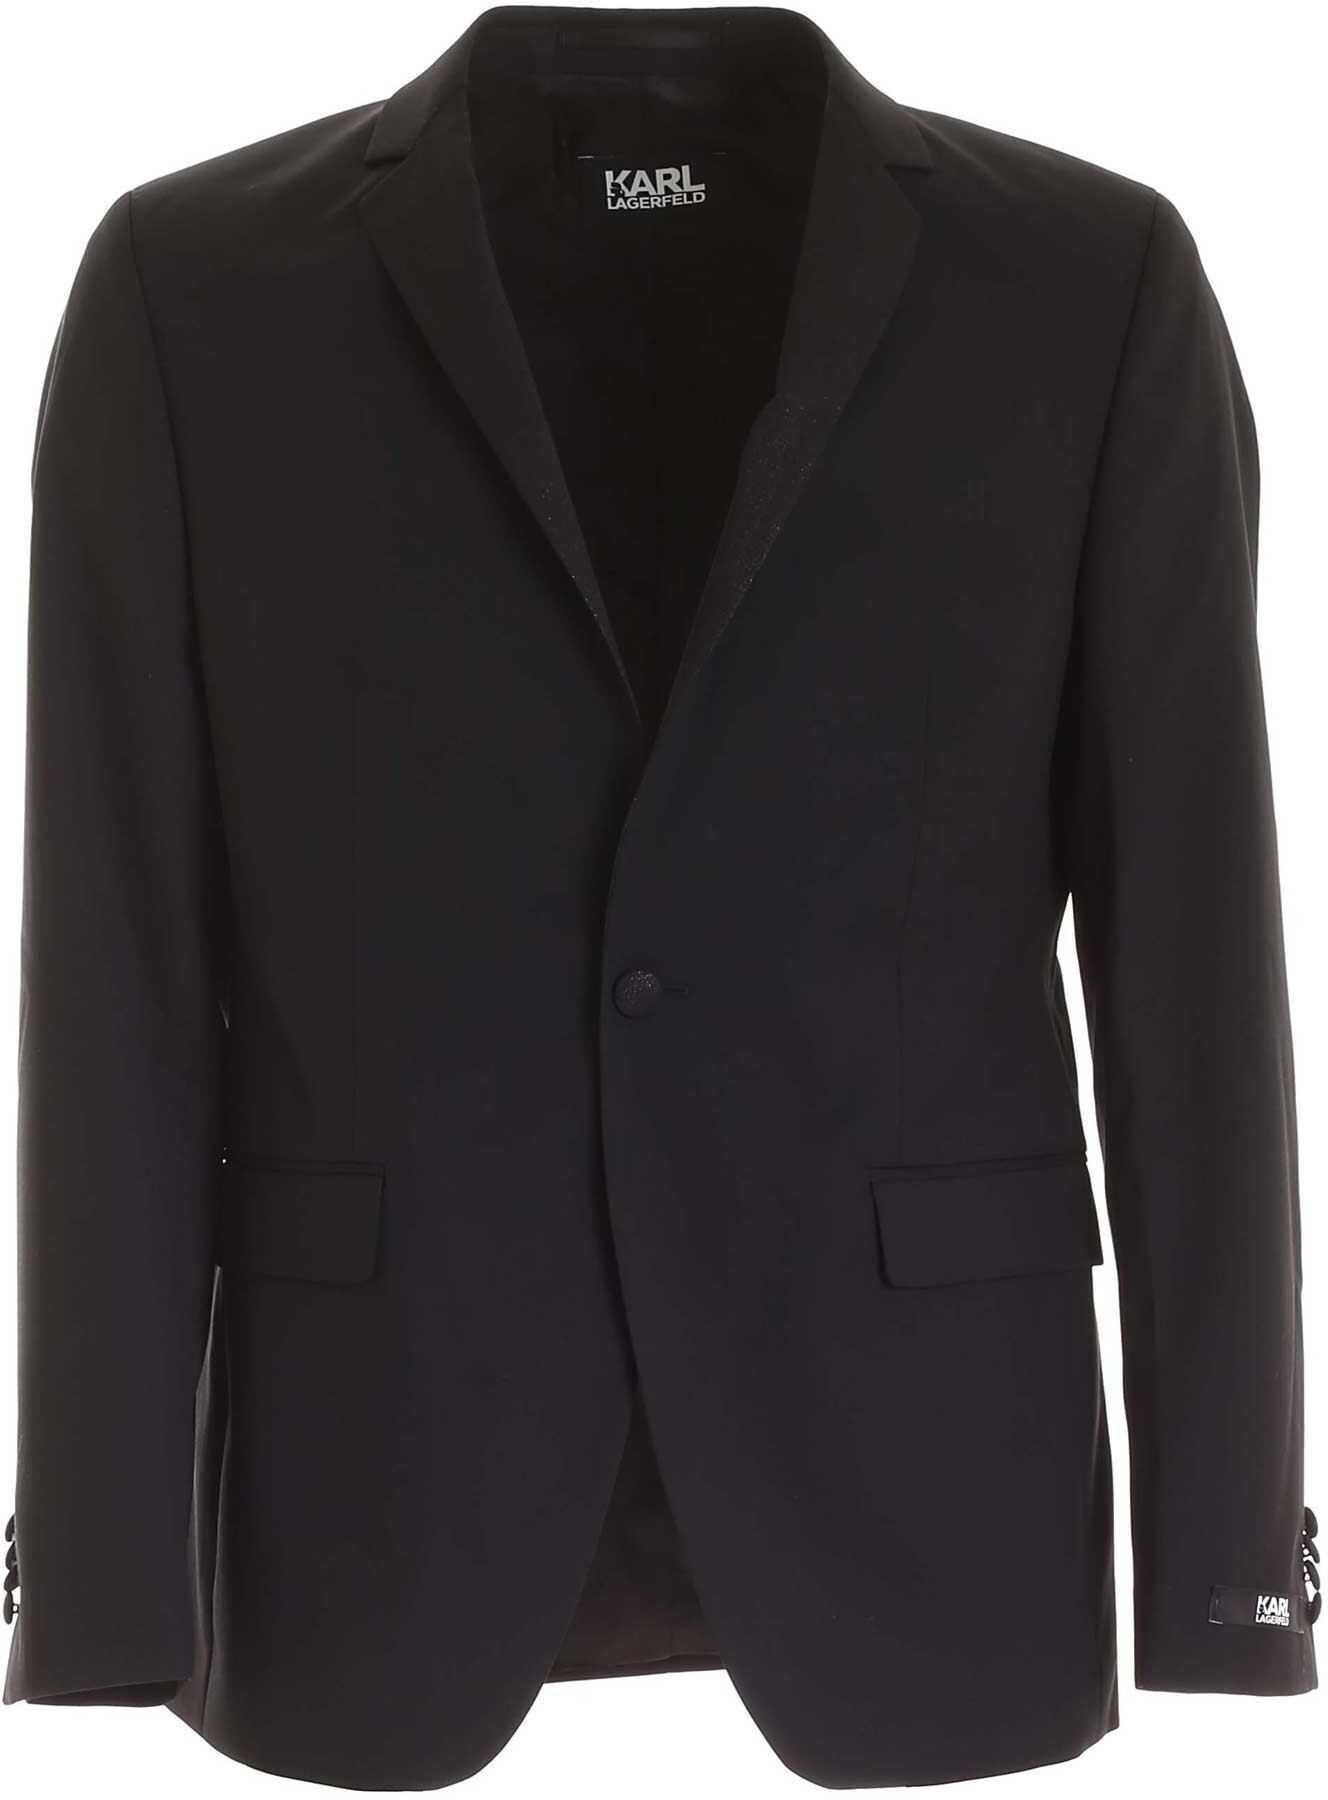 Karl Lagerfeld Lamé Detail Jacket In Black Black imagine